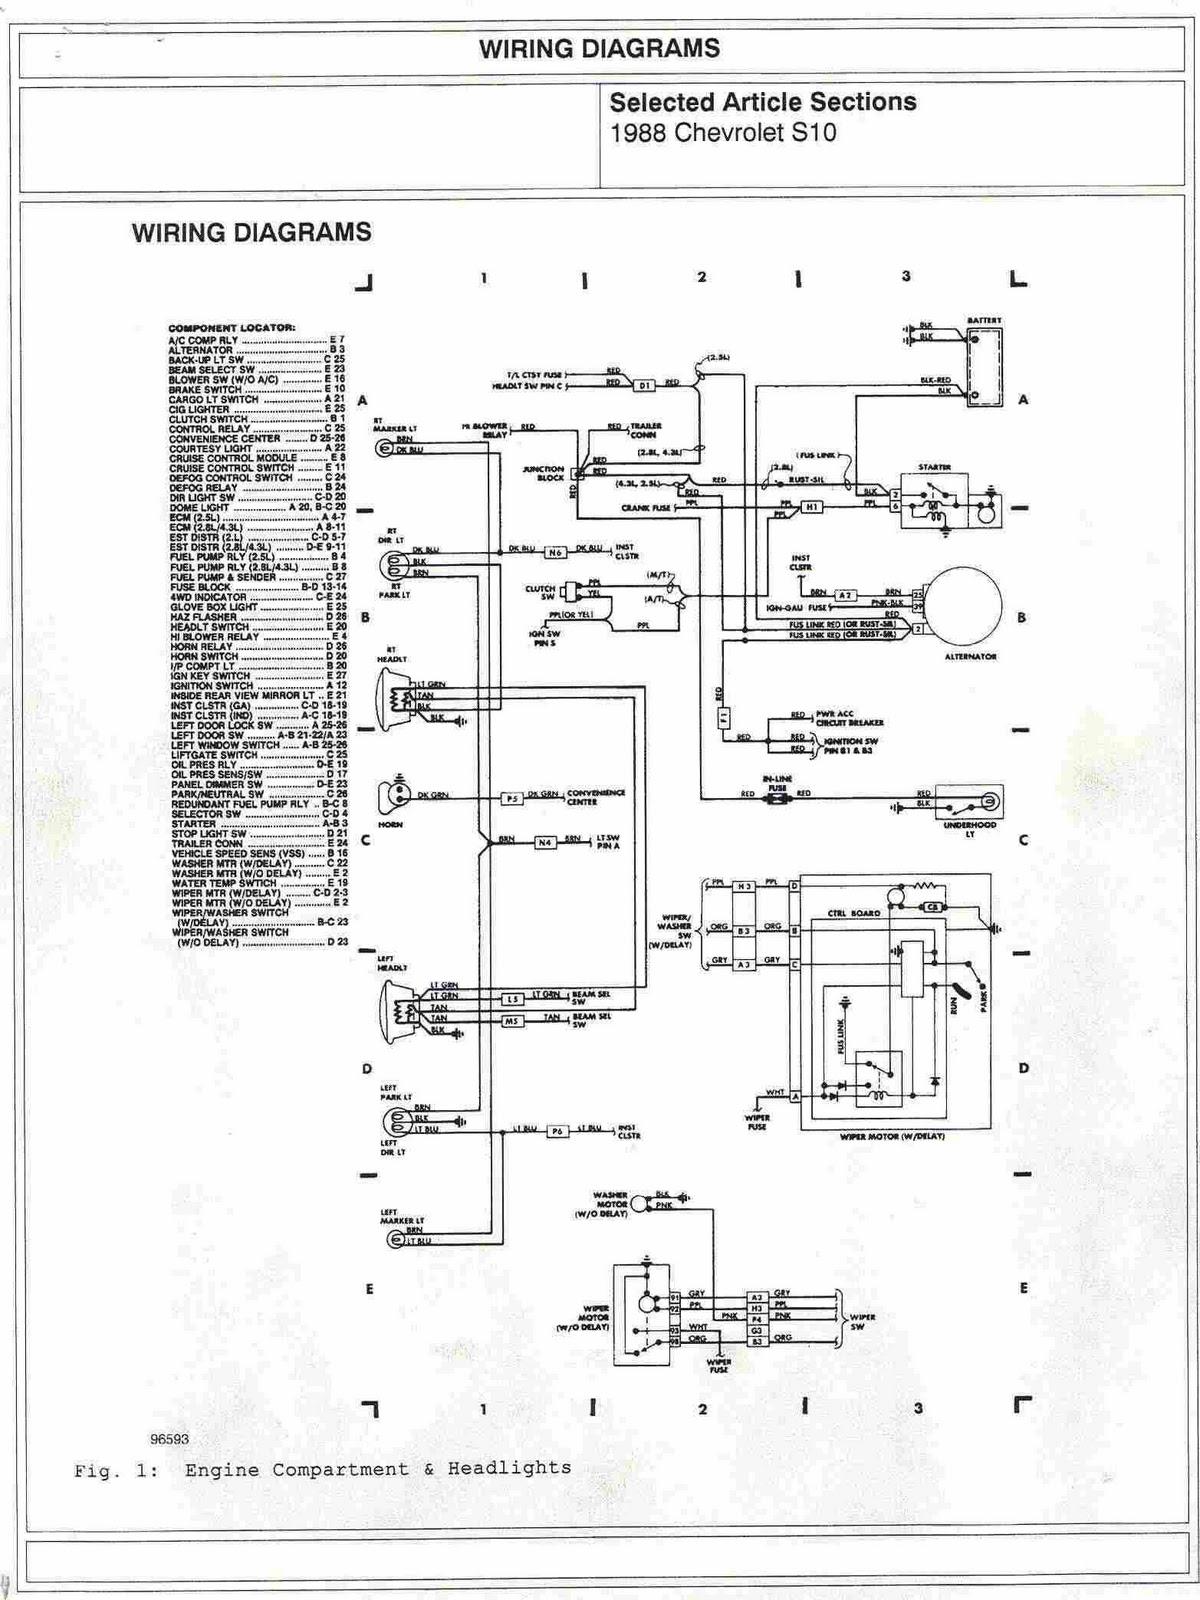 1991 Chrysler Lebaron Wiring Diagram Simple 93 Fuse Box 87 Cougar Manual Guide U2022 Ford Tempo